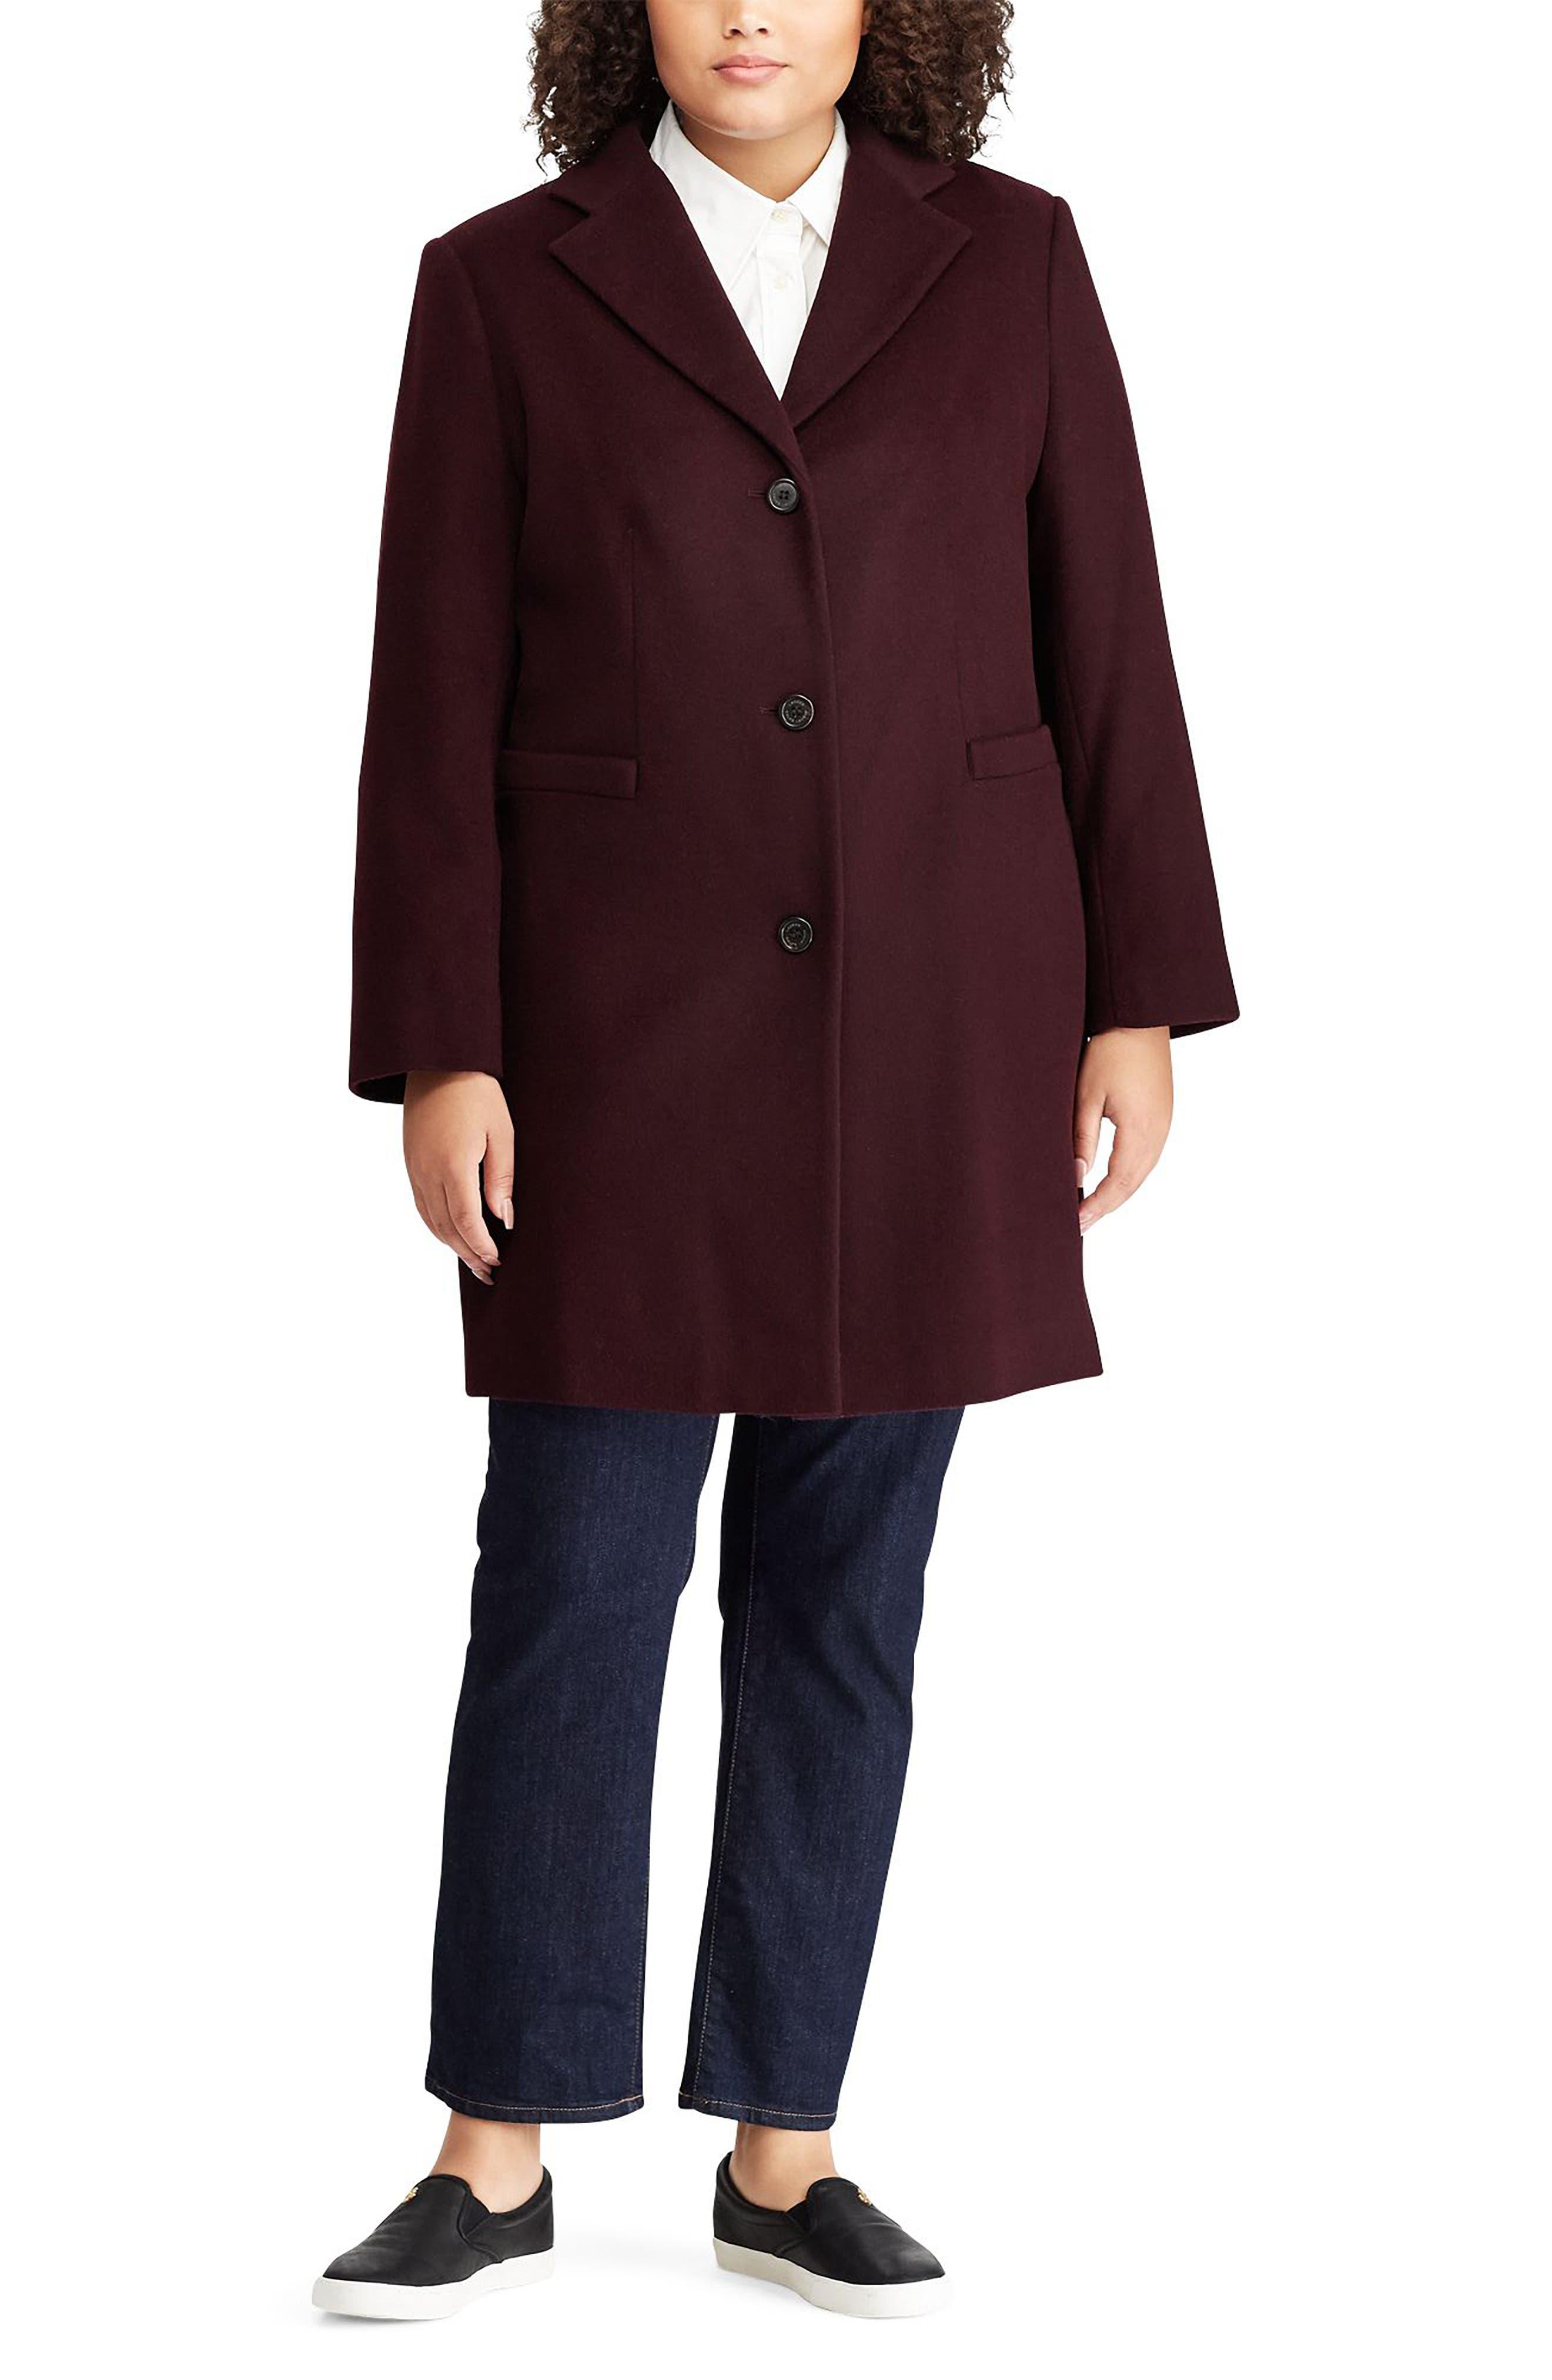 LAUREN RALPH LAUREN,                             Wool Blend Reefer Coat,                             Alternate thumbnail 3, color,                             BURGUNDY